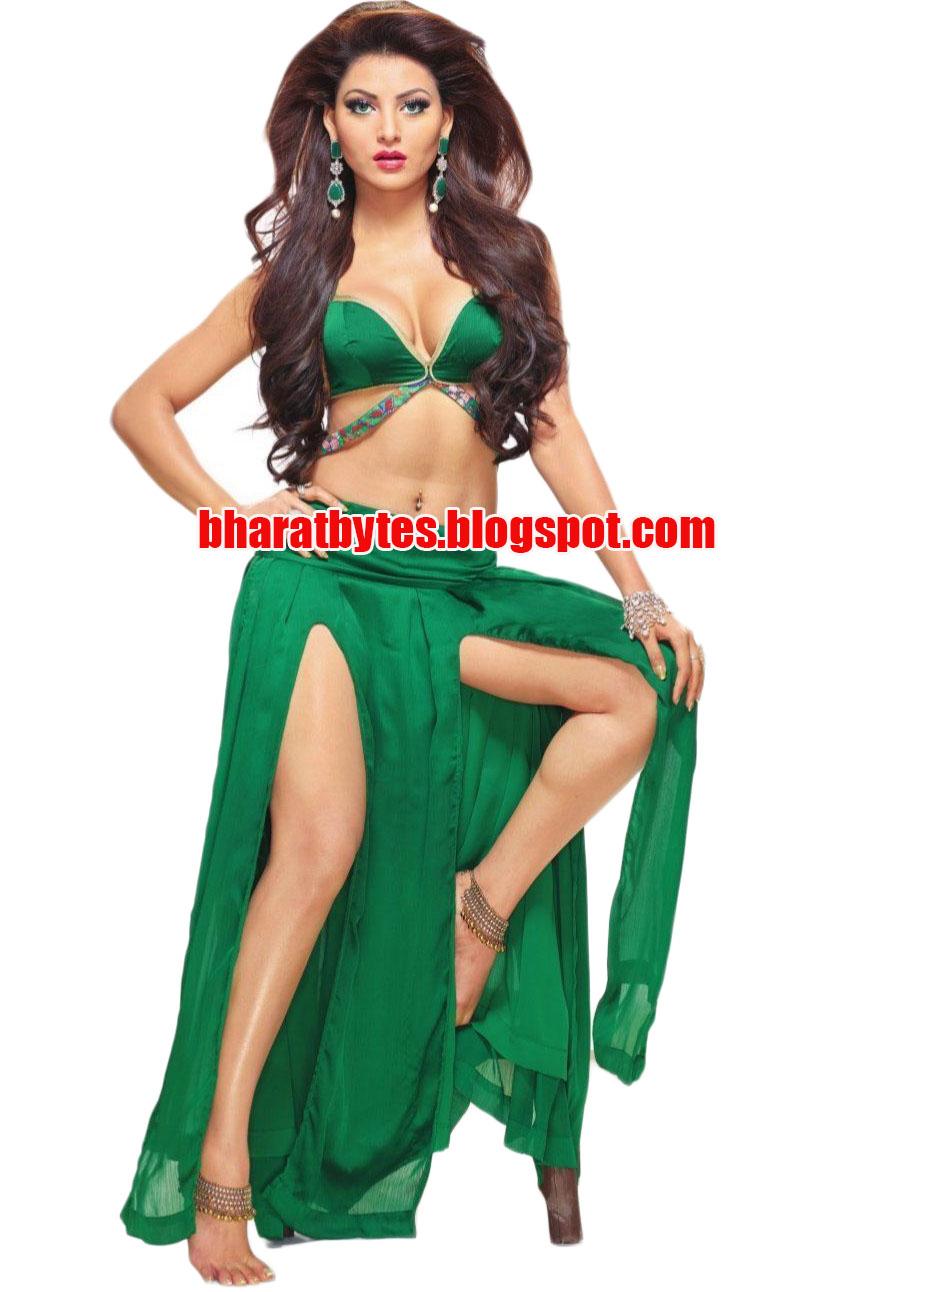 Aishwarya rai virginity